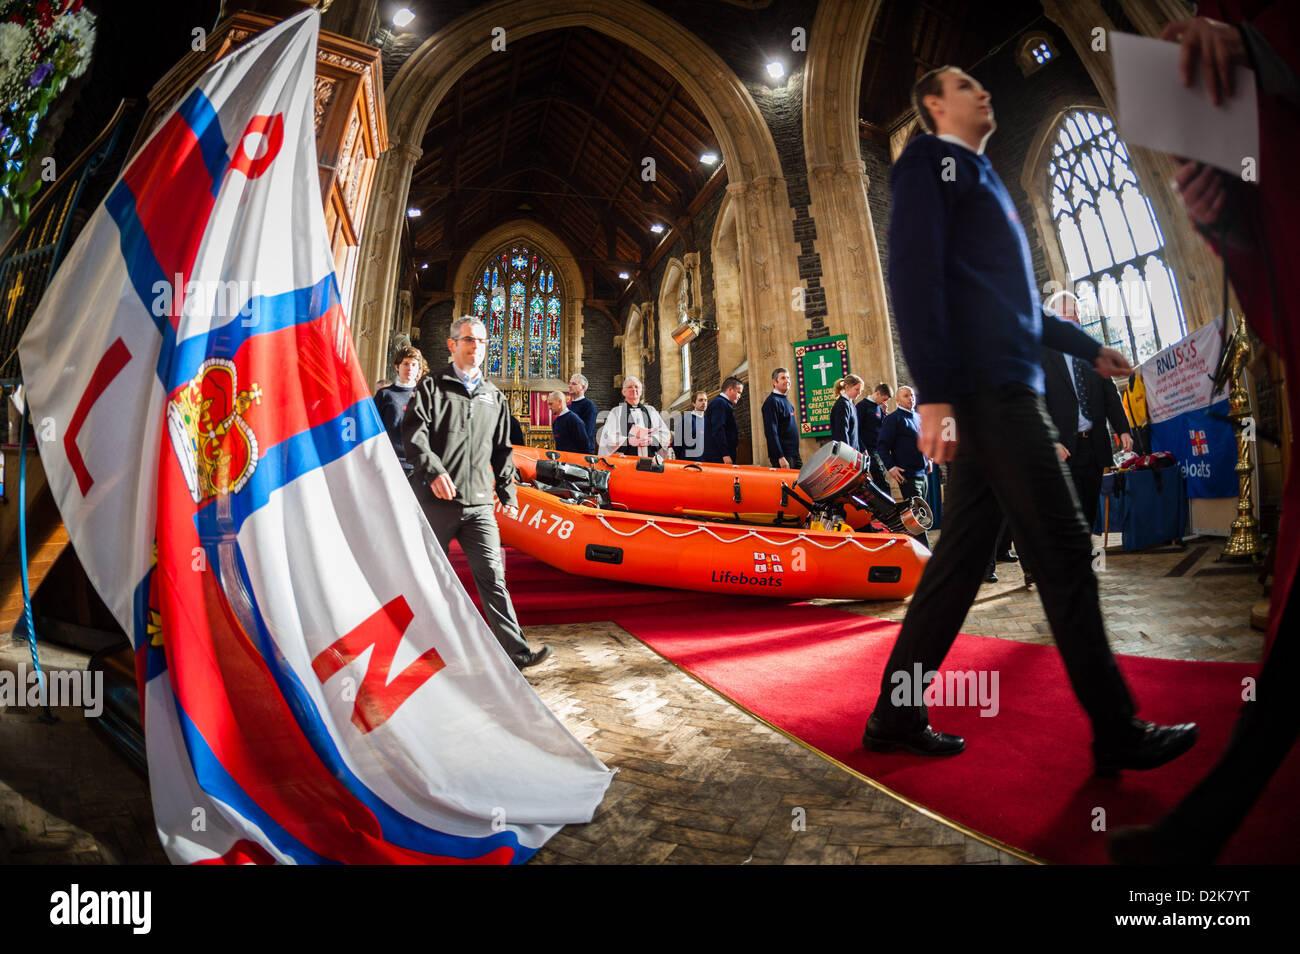 Aberystwyth Wales UK. Sonntag, 27. Januar 2013. Die RNLI (Royal National Lifeboat Institution) Arancia-Klasse inshore Stockbild